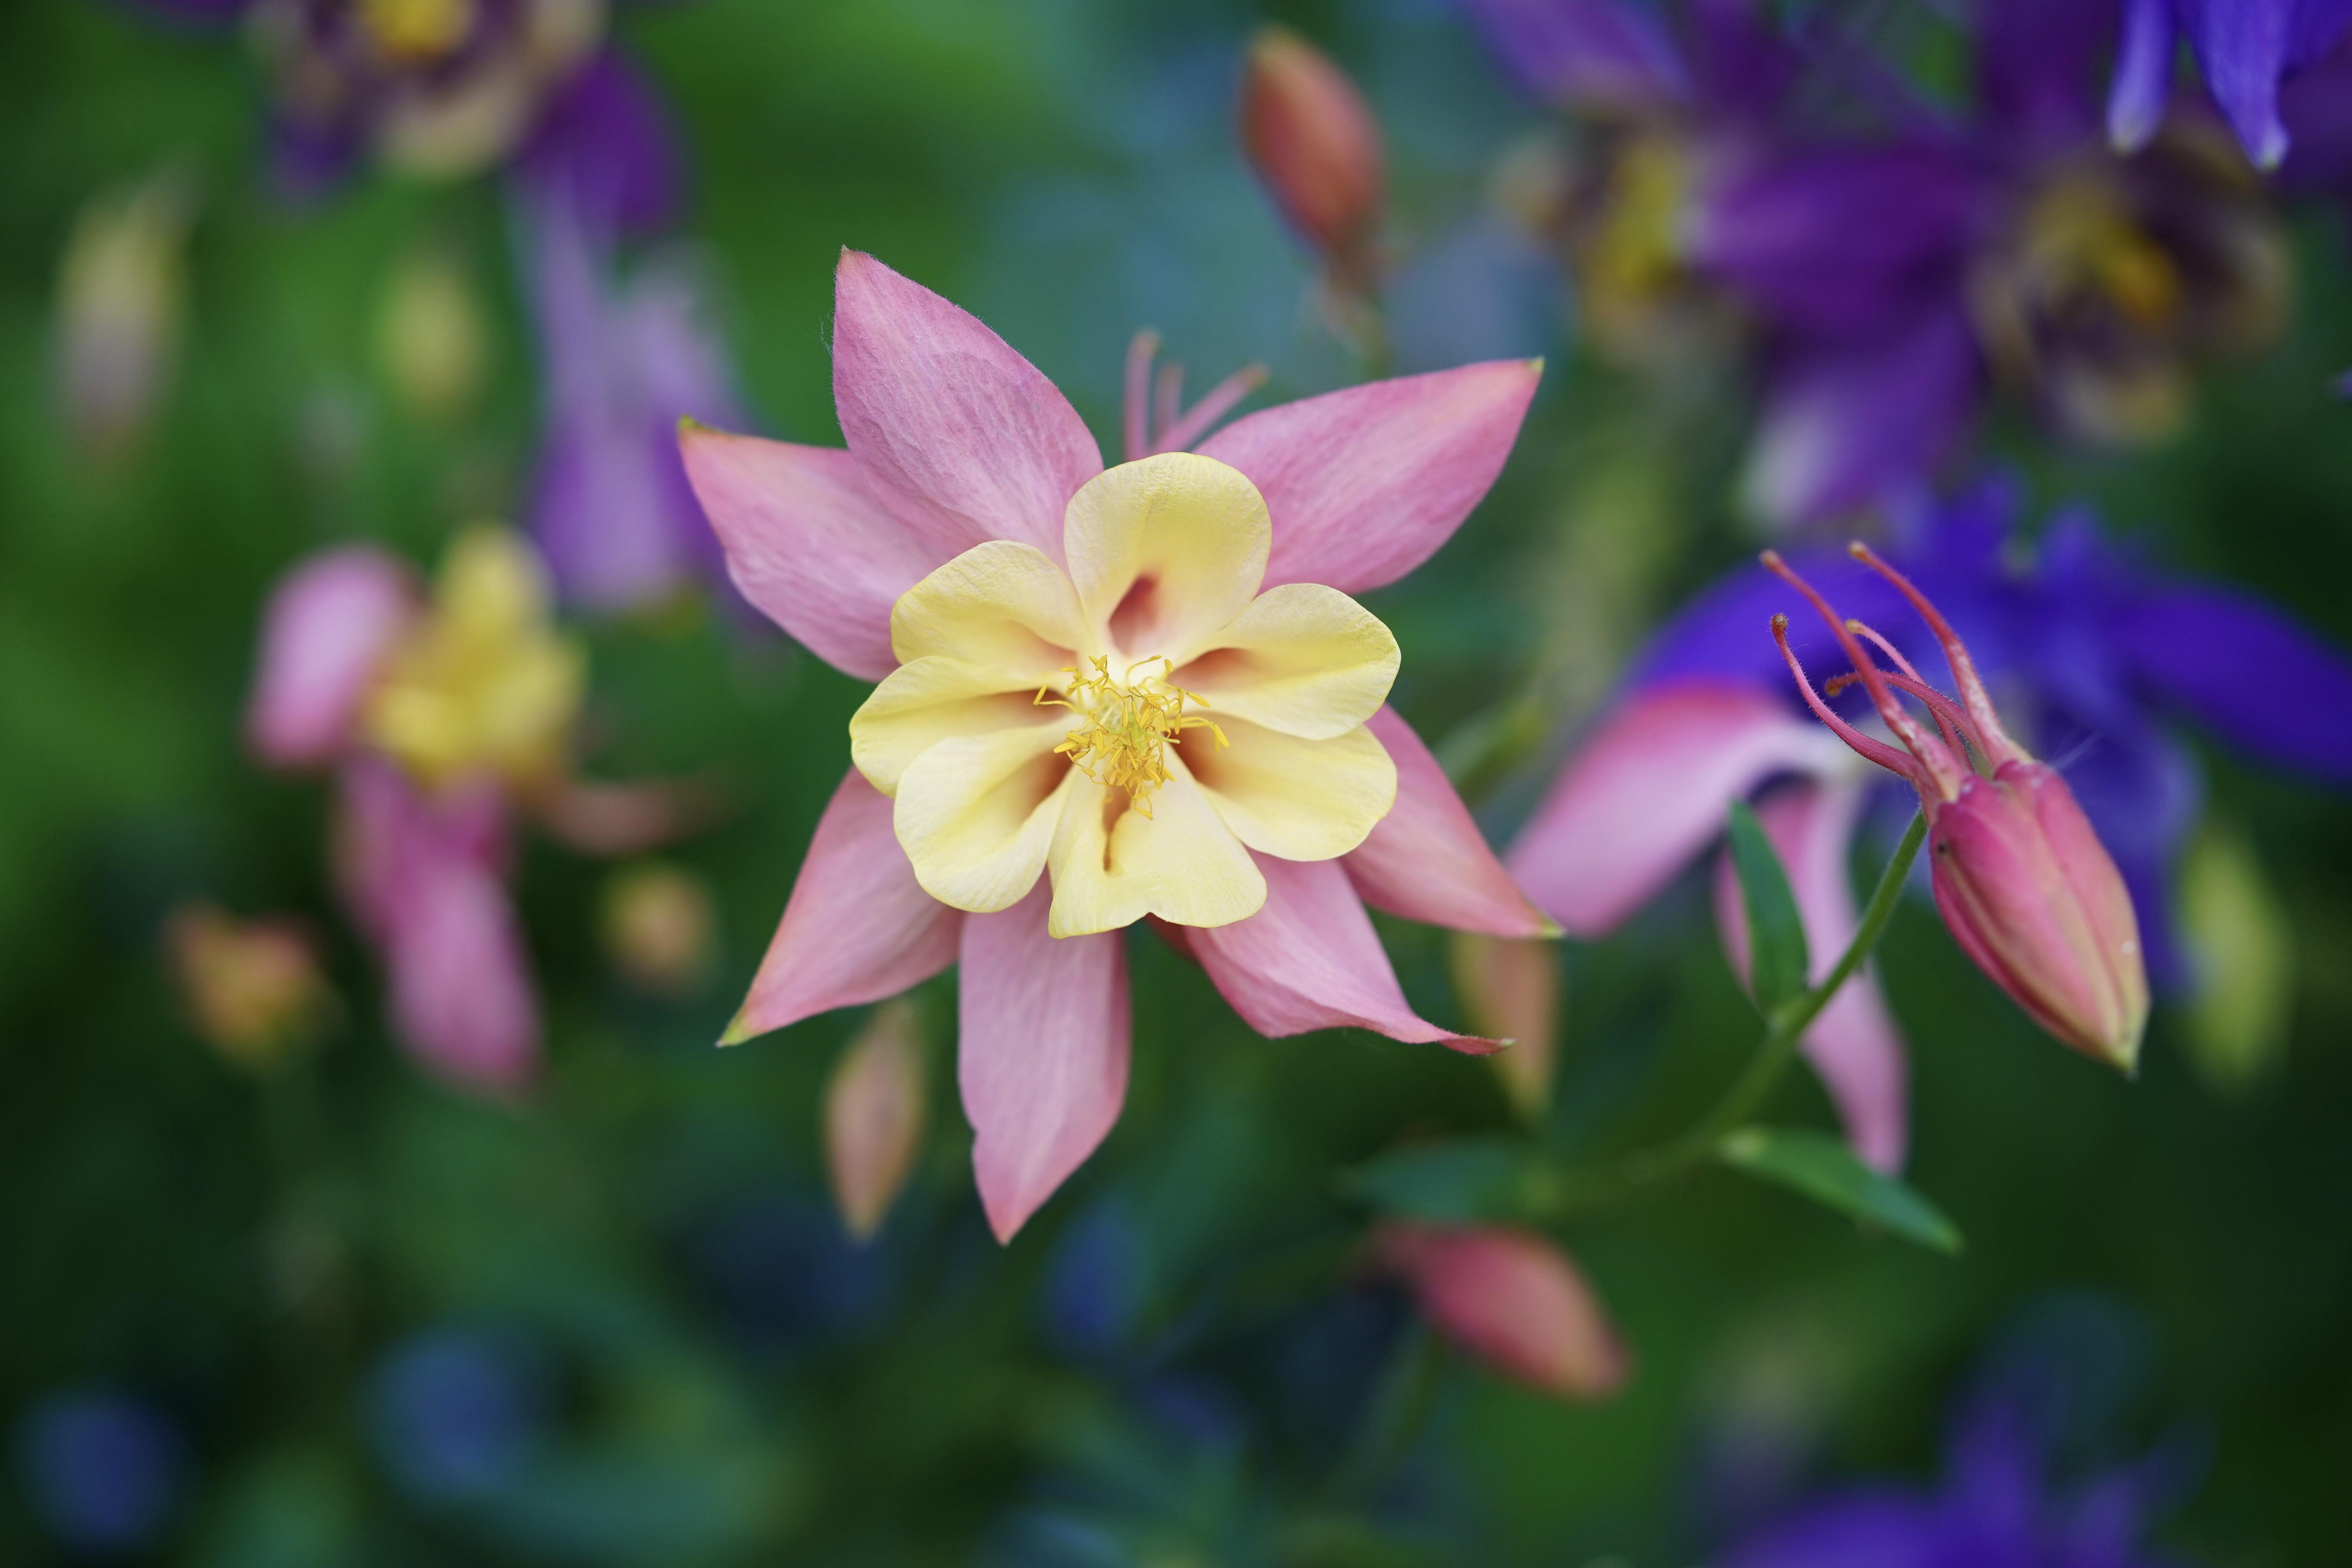 Desktop Wallpapers Bokeh flower Closeup blurred background Flowers